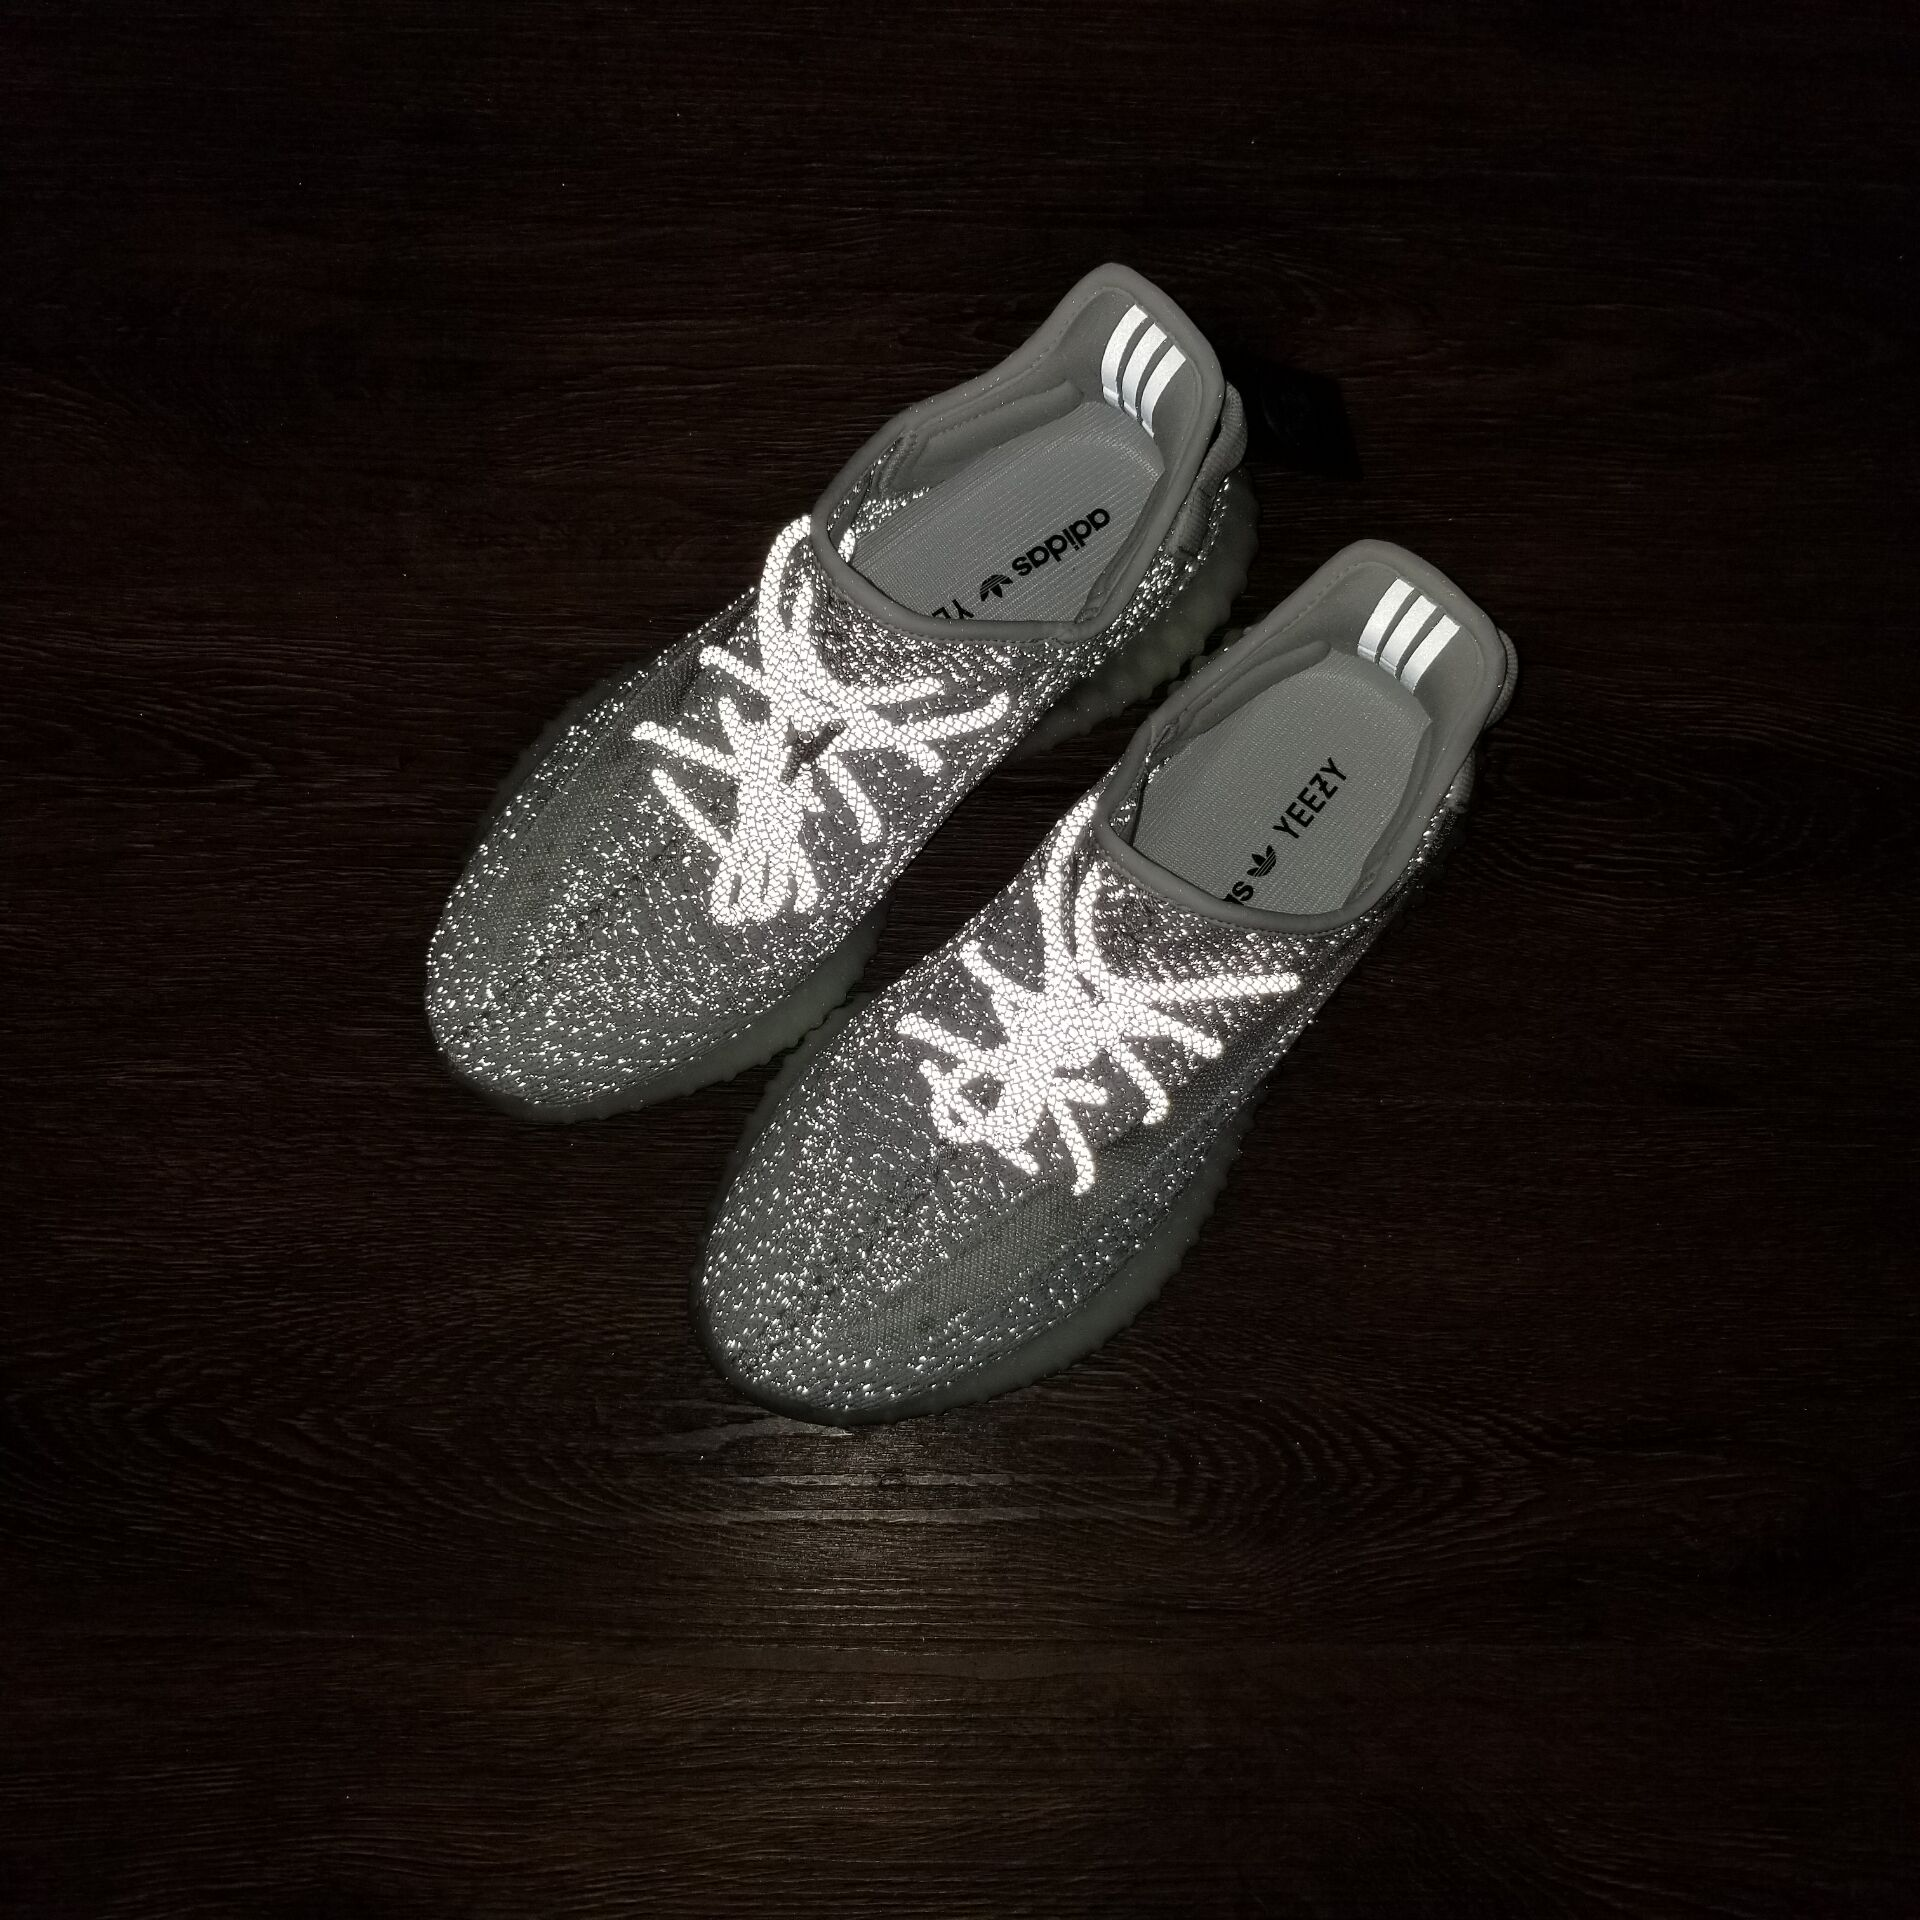 934372a9b1126 ... Adidas Yeezy Boost 350 V2  Static Reflective  Shoes EF2367 - Thumbnail  ...